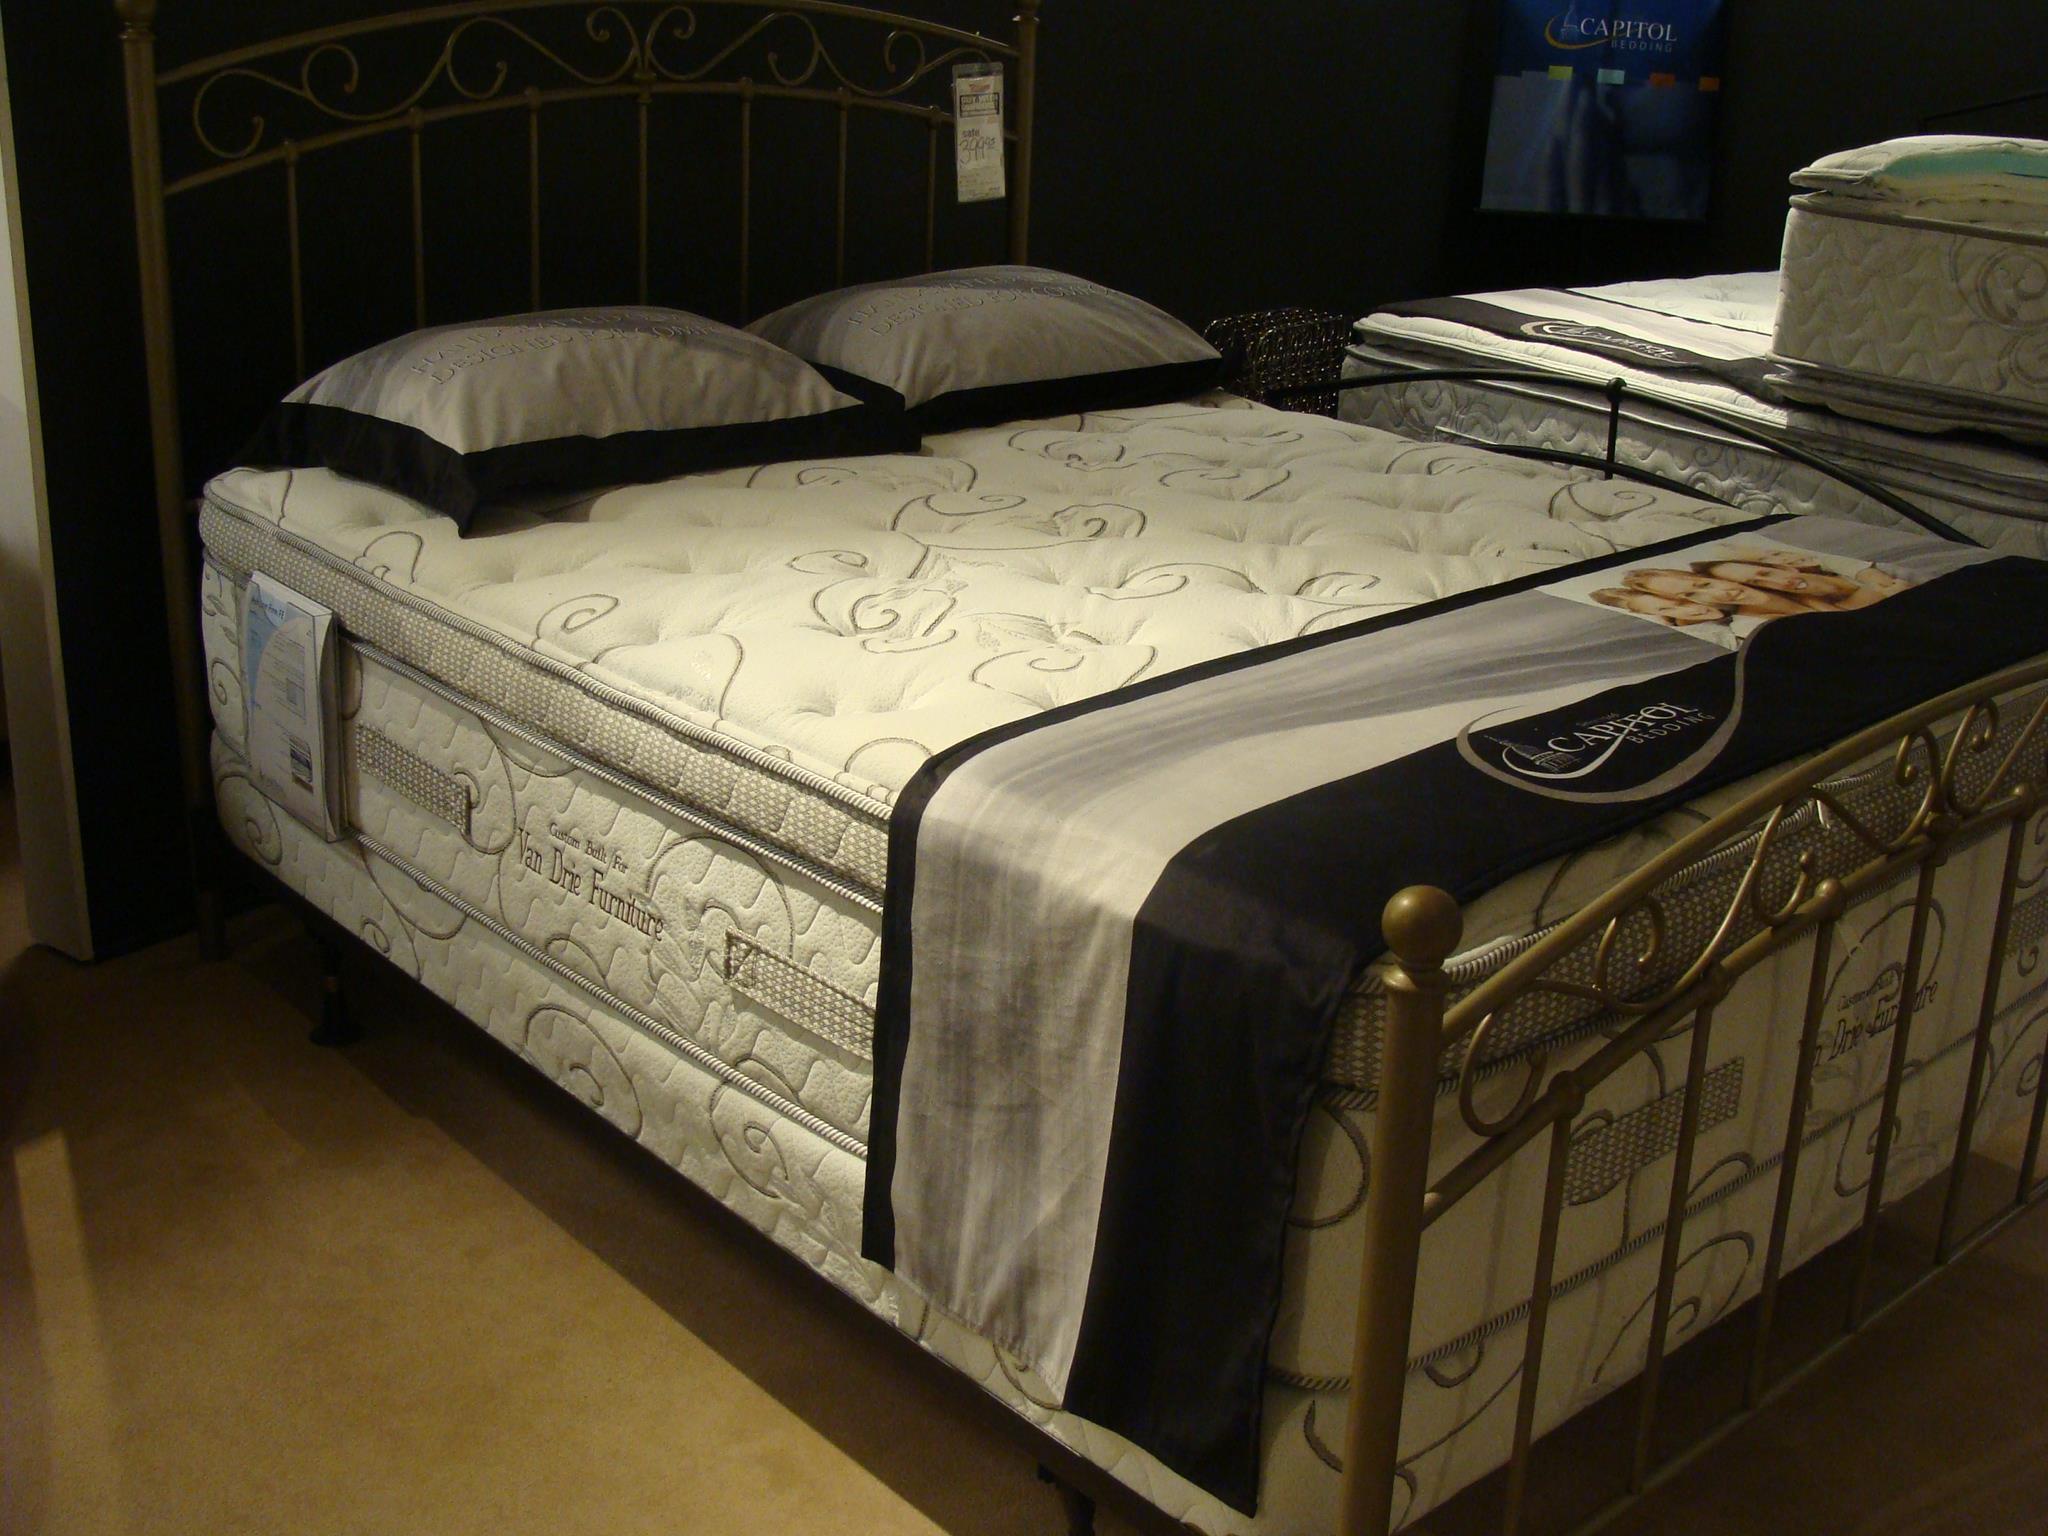 Capitol Bedding Grandeur King Firm Mattress Set - Item Number: Firm-K+2xHMI-K